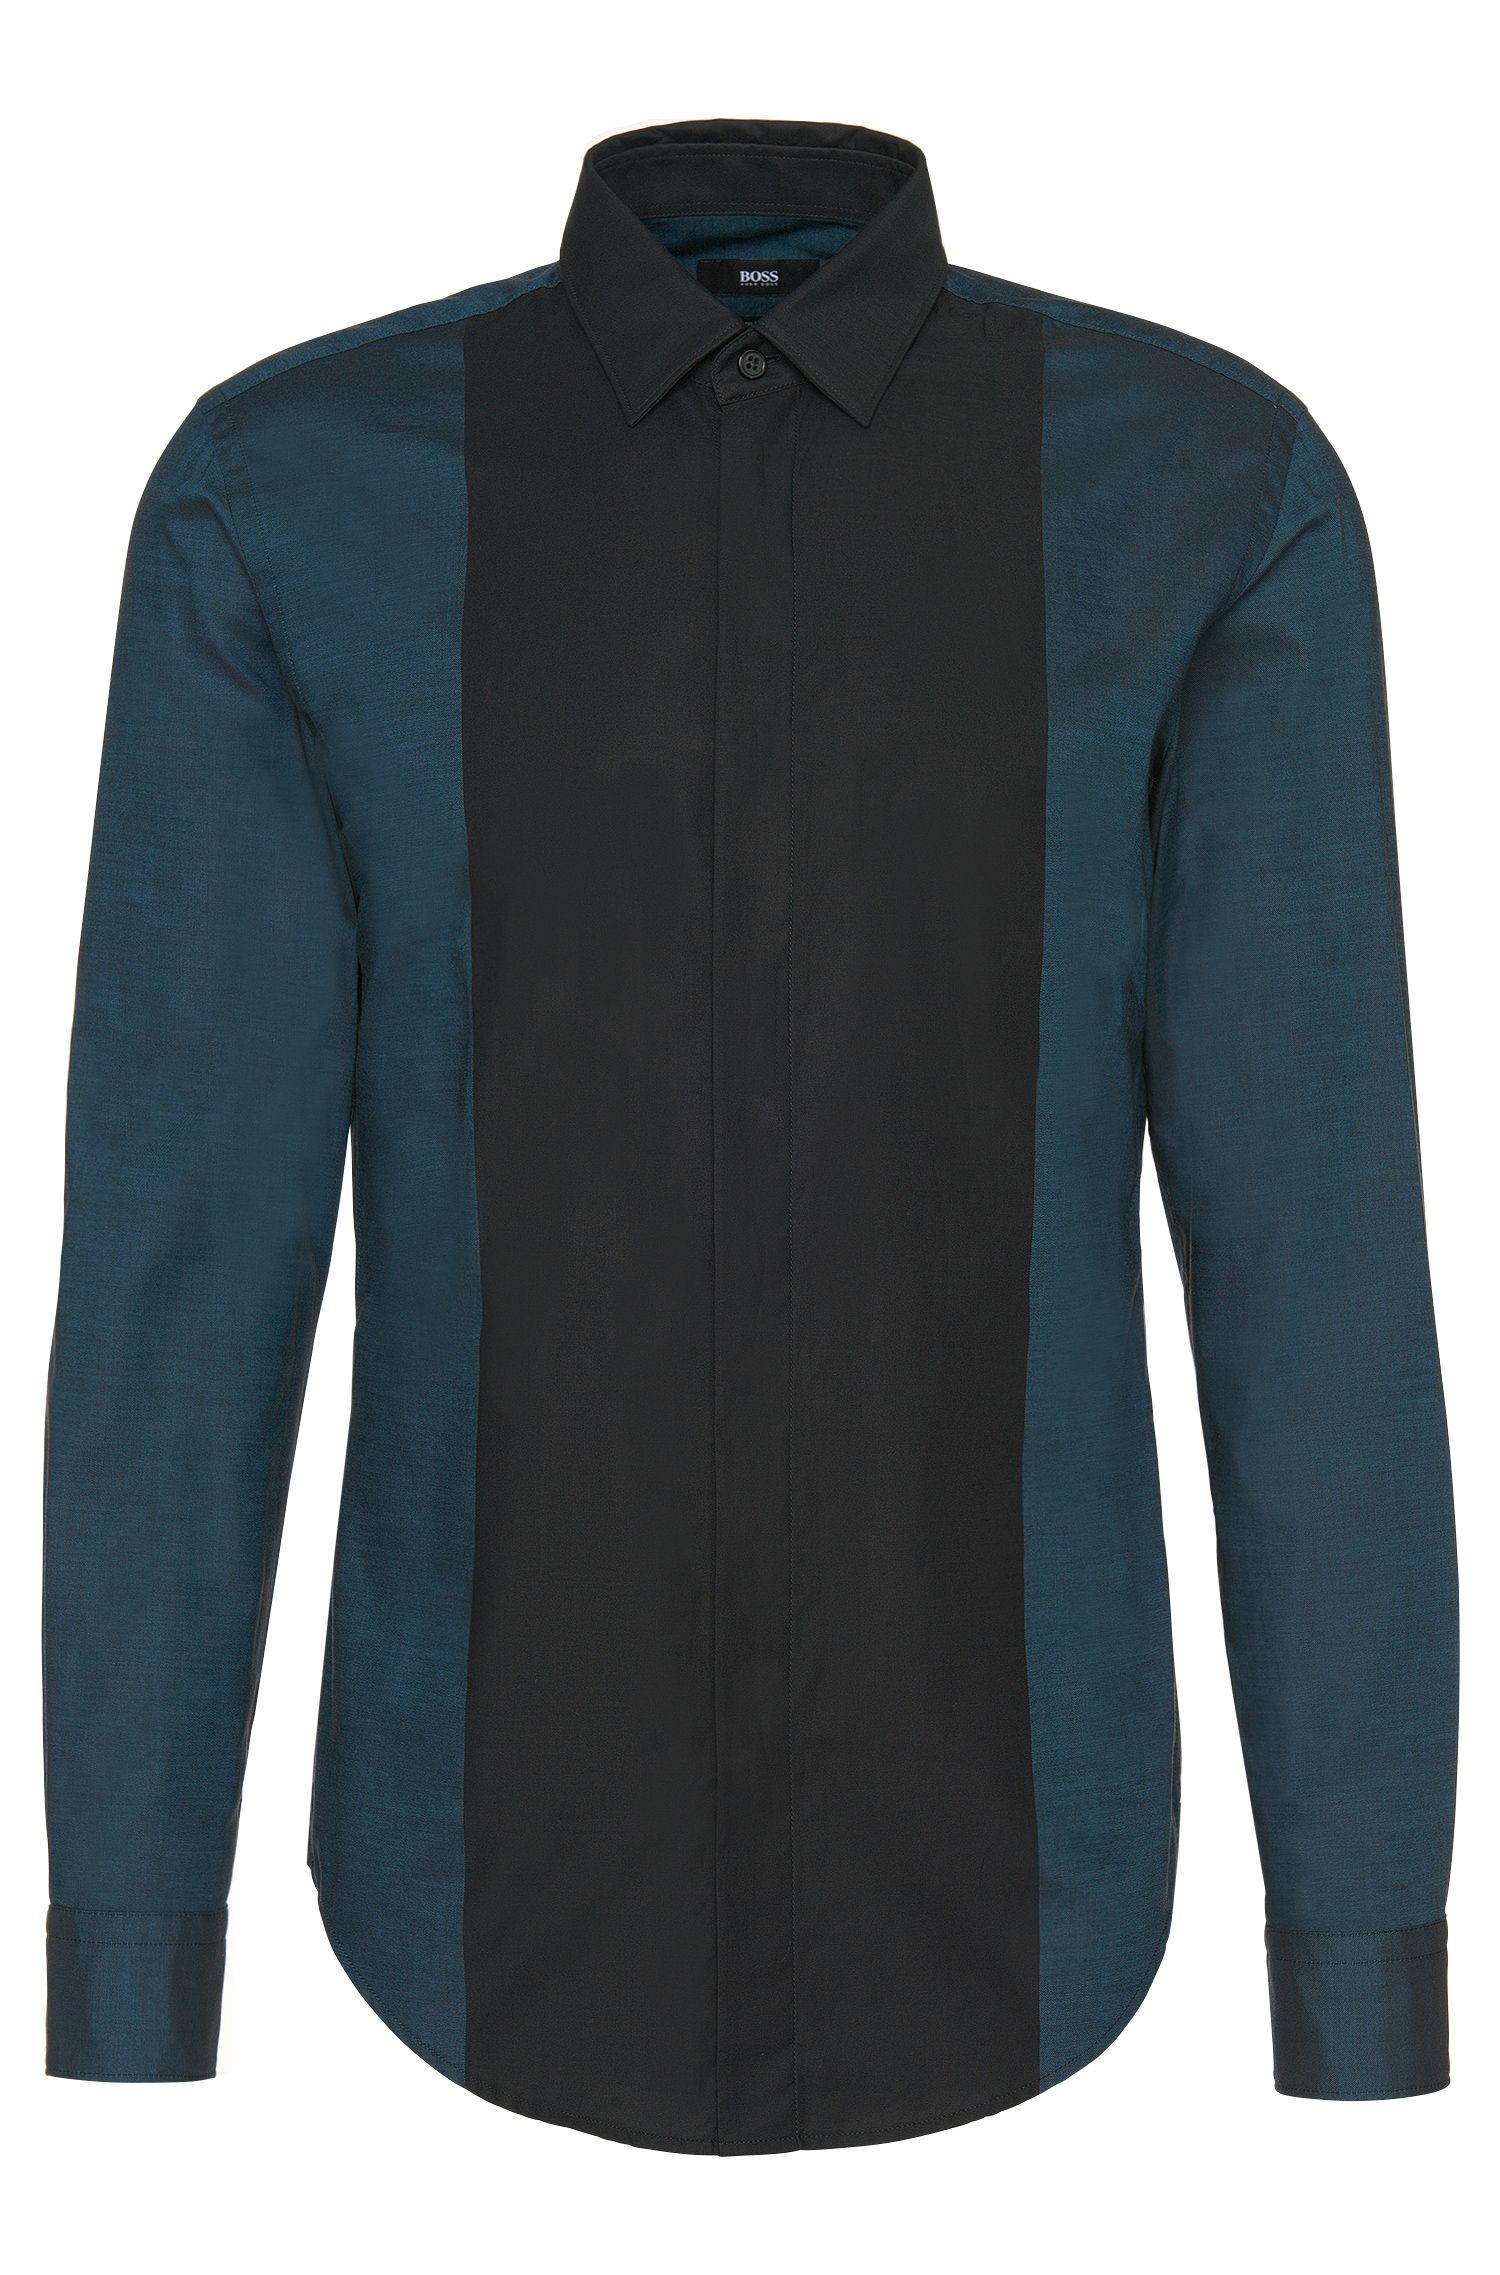 'Ronni H' | Slim Fit, Cotton Button Down Shirt